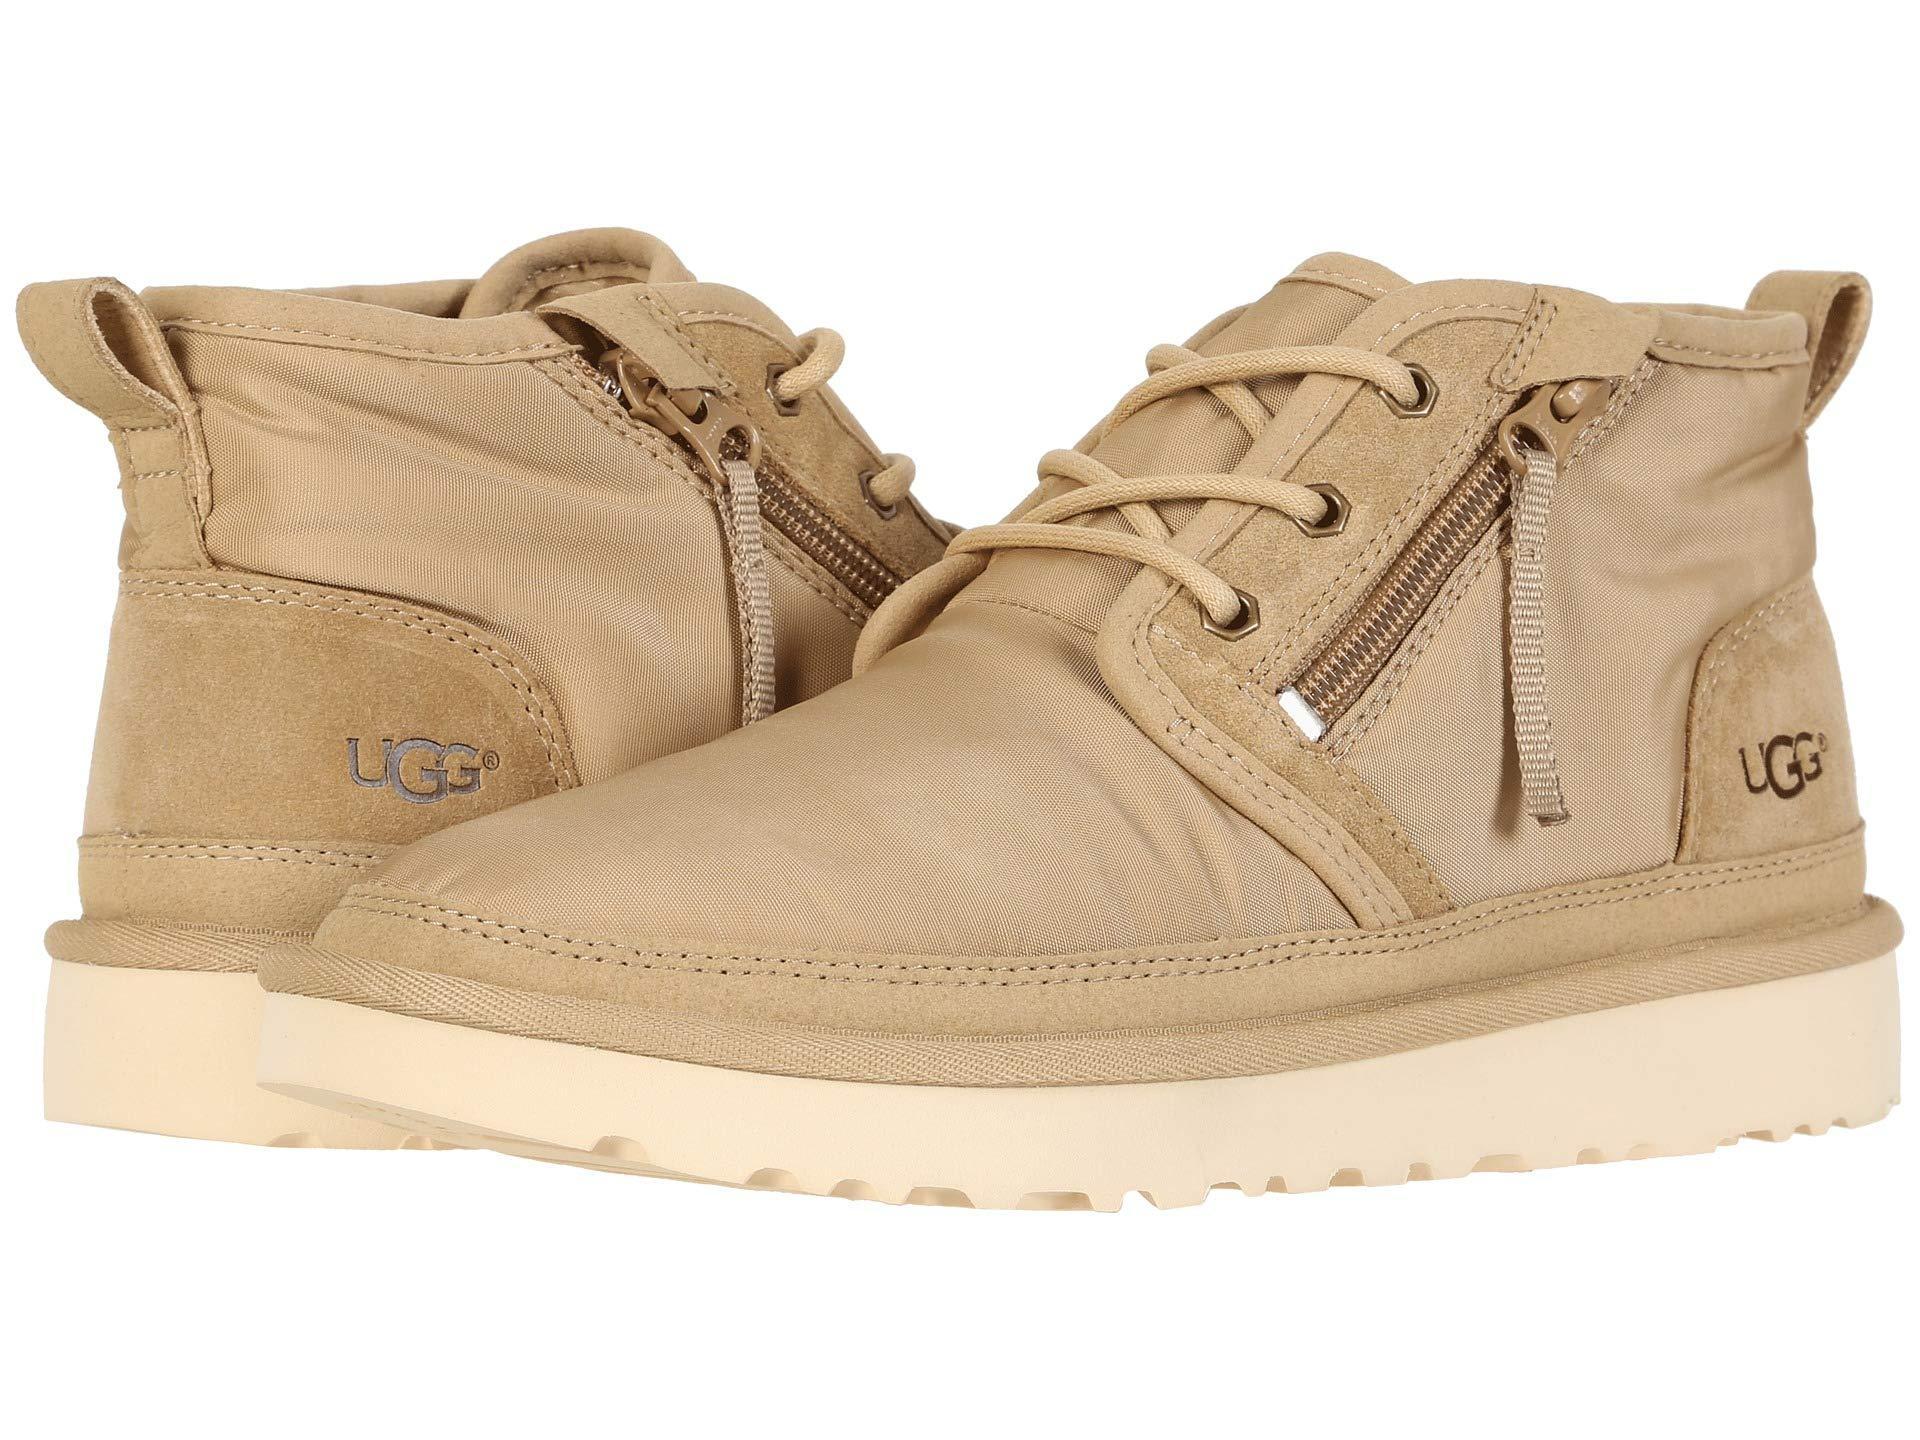 72f942053d8 Ugg Natural Neumel Zip Mlt (vaporous Gray) Men's Shoes for men